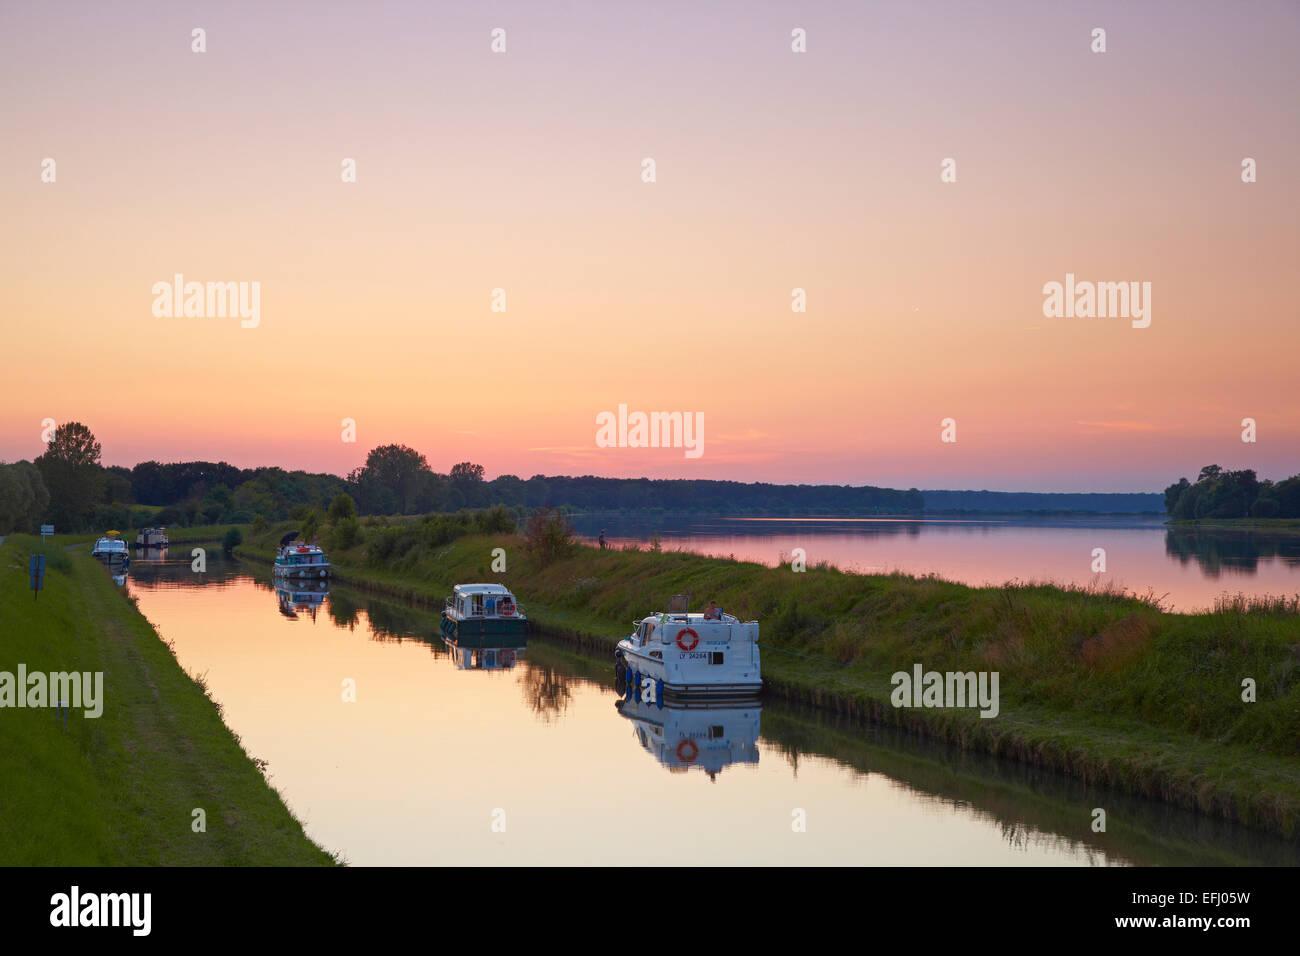 Summer evening on the Canal de la Marne au Rhin at Gondrexange, Moselle, Region Alsace Lorraine, France, Europe - Stock Image